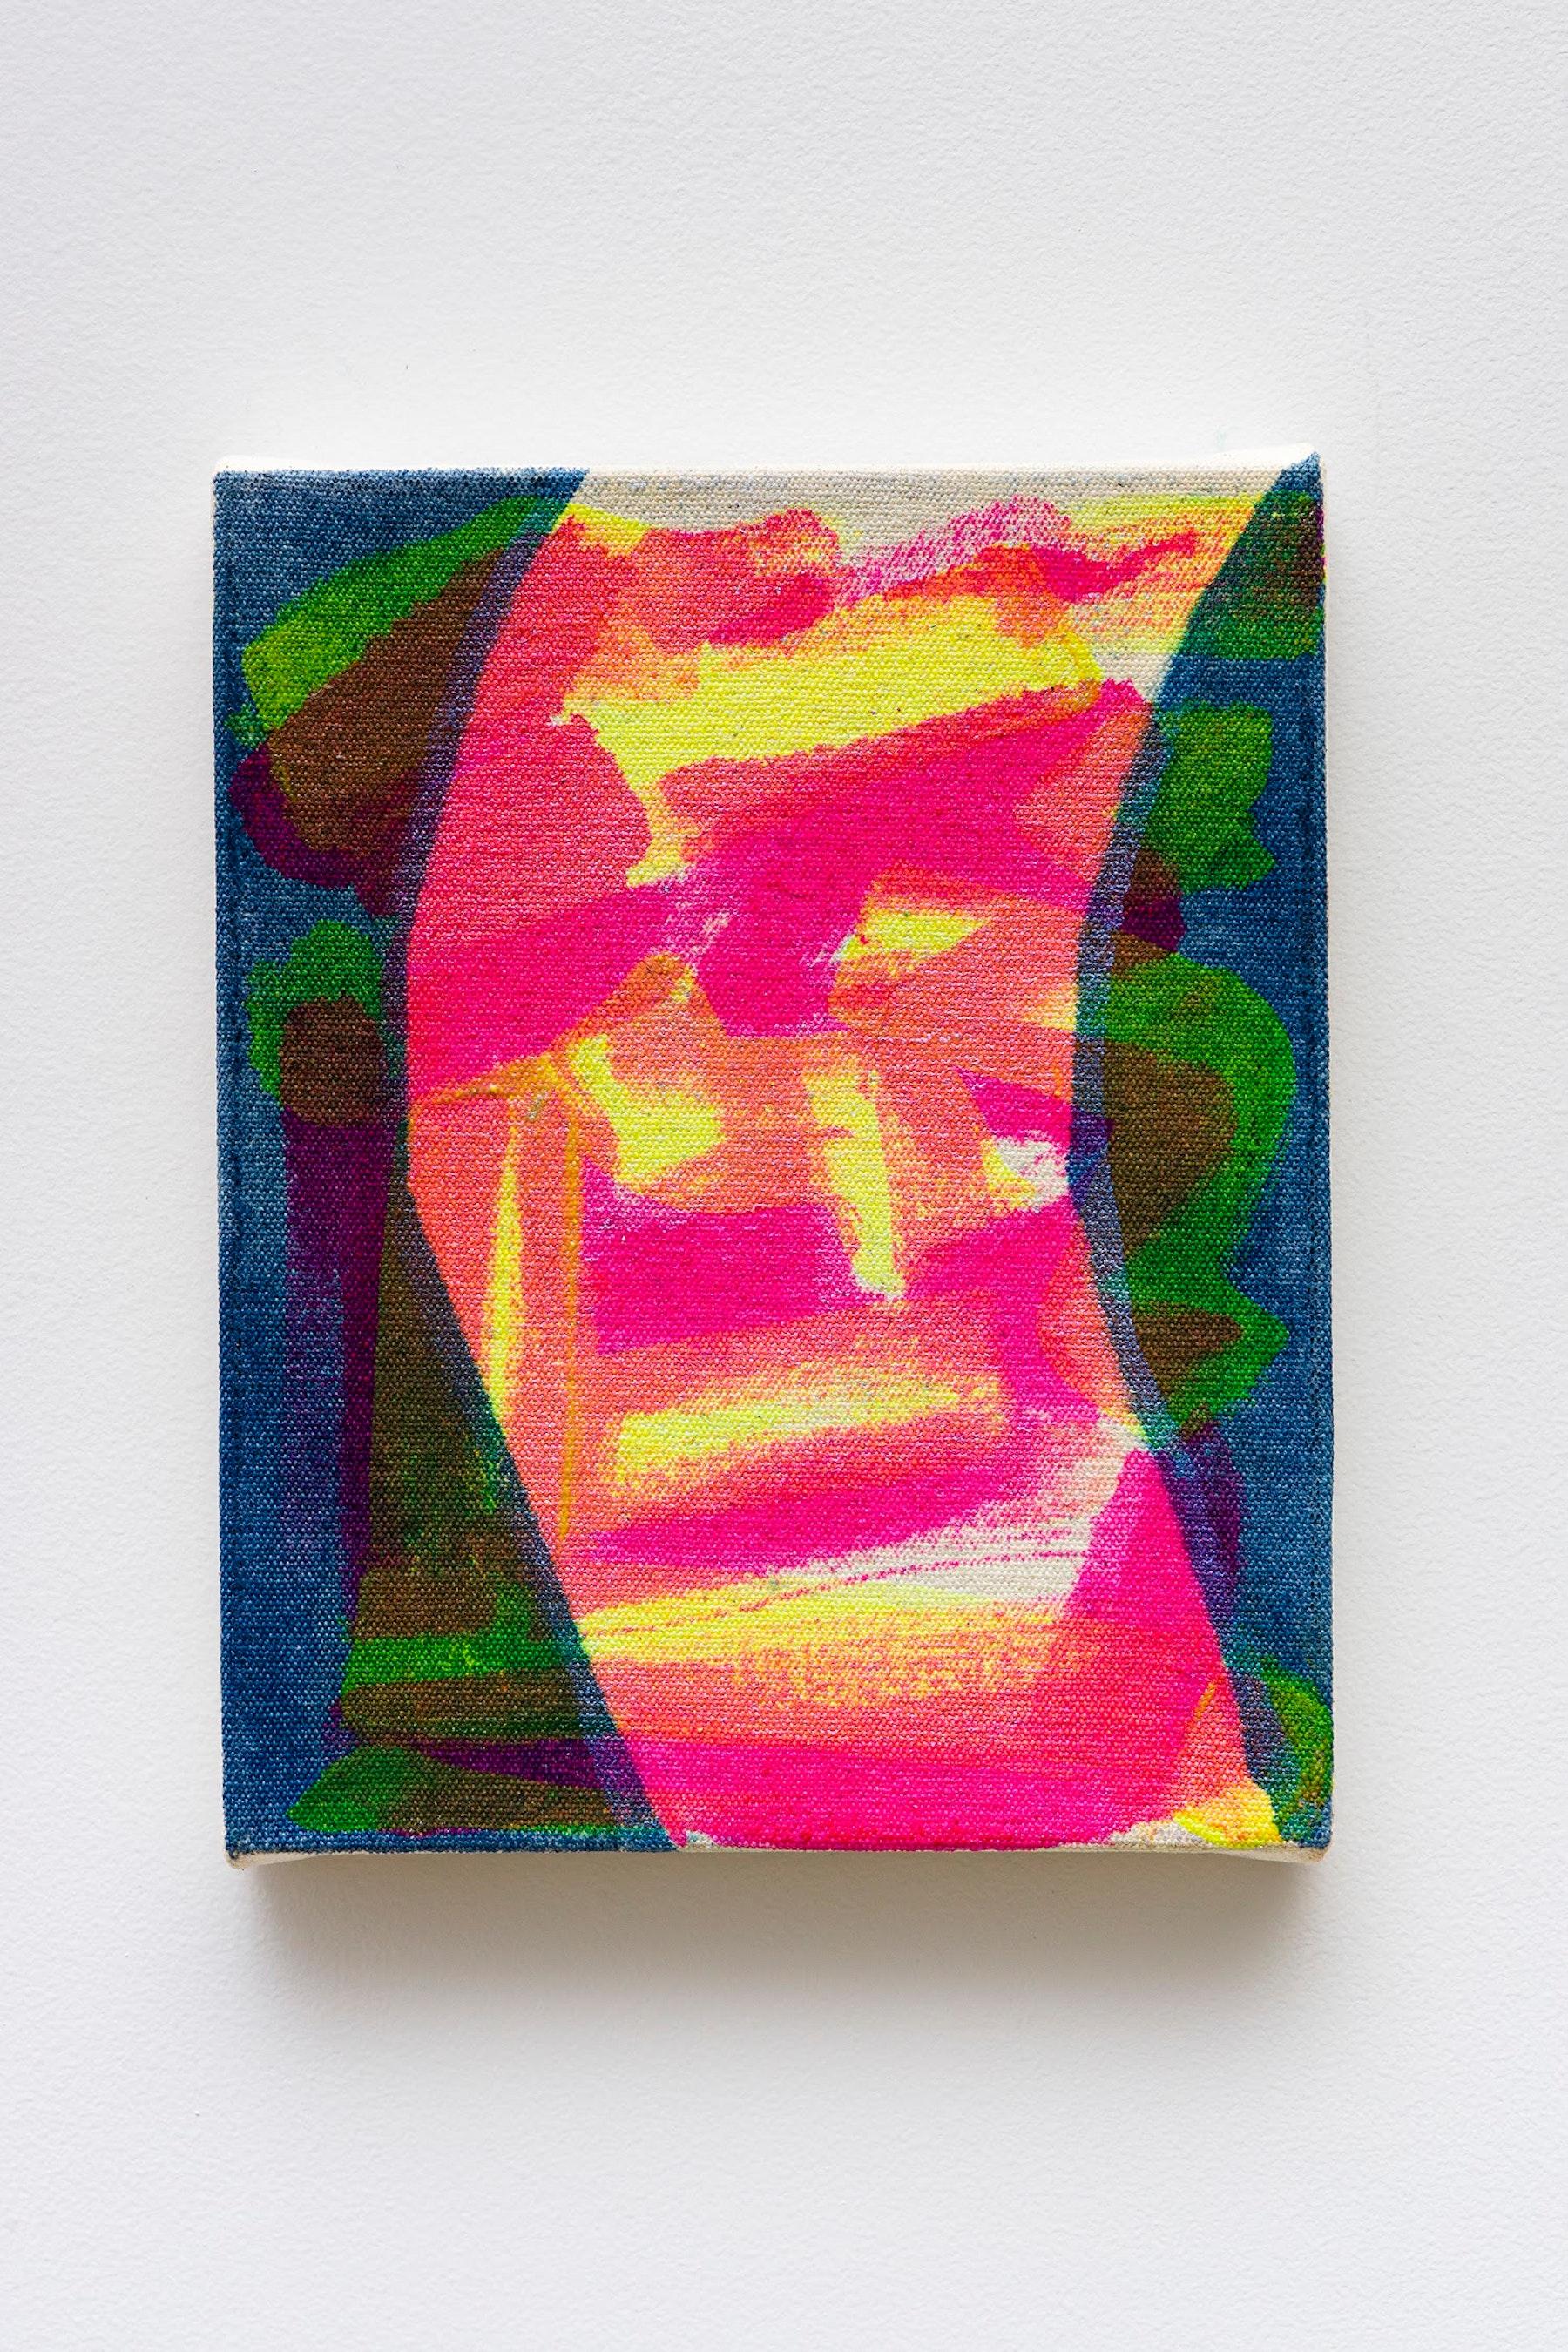 "Monique Van Genderen ""Untitled,"" 2020 Oil on canvas 10 x 8"" [HxW] (25.4 x 20.32 cm) Inventory #VGE401 Courtesy of the artist and Vielmetter Los Angeles Photo credit: Jeff Mclane"